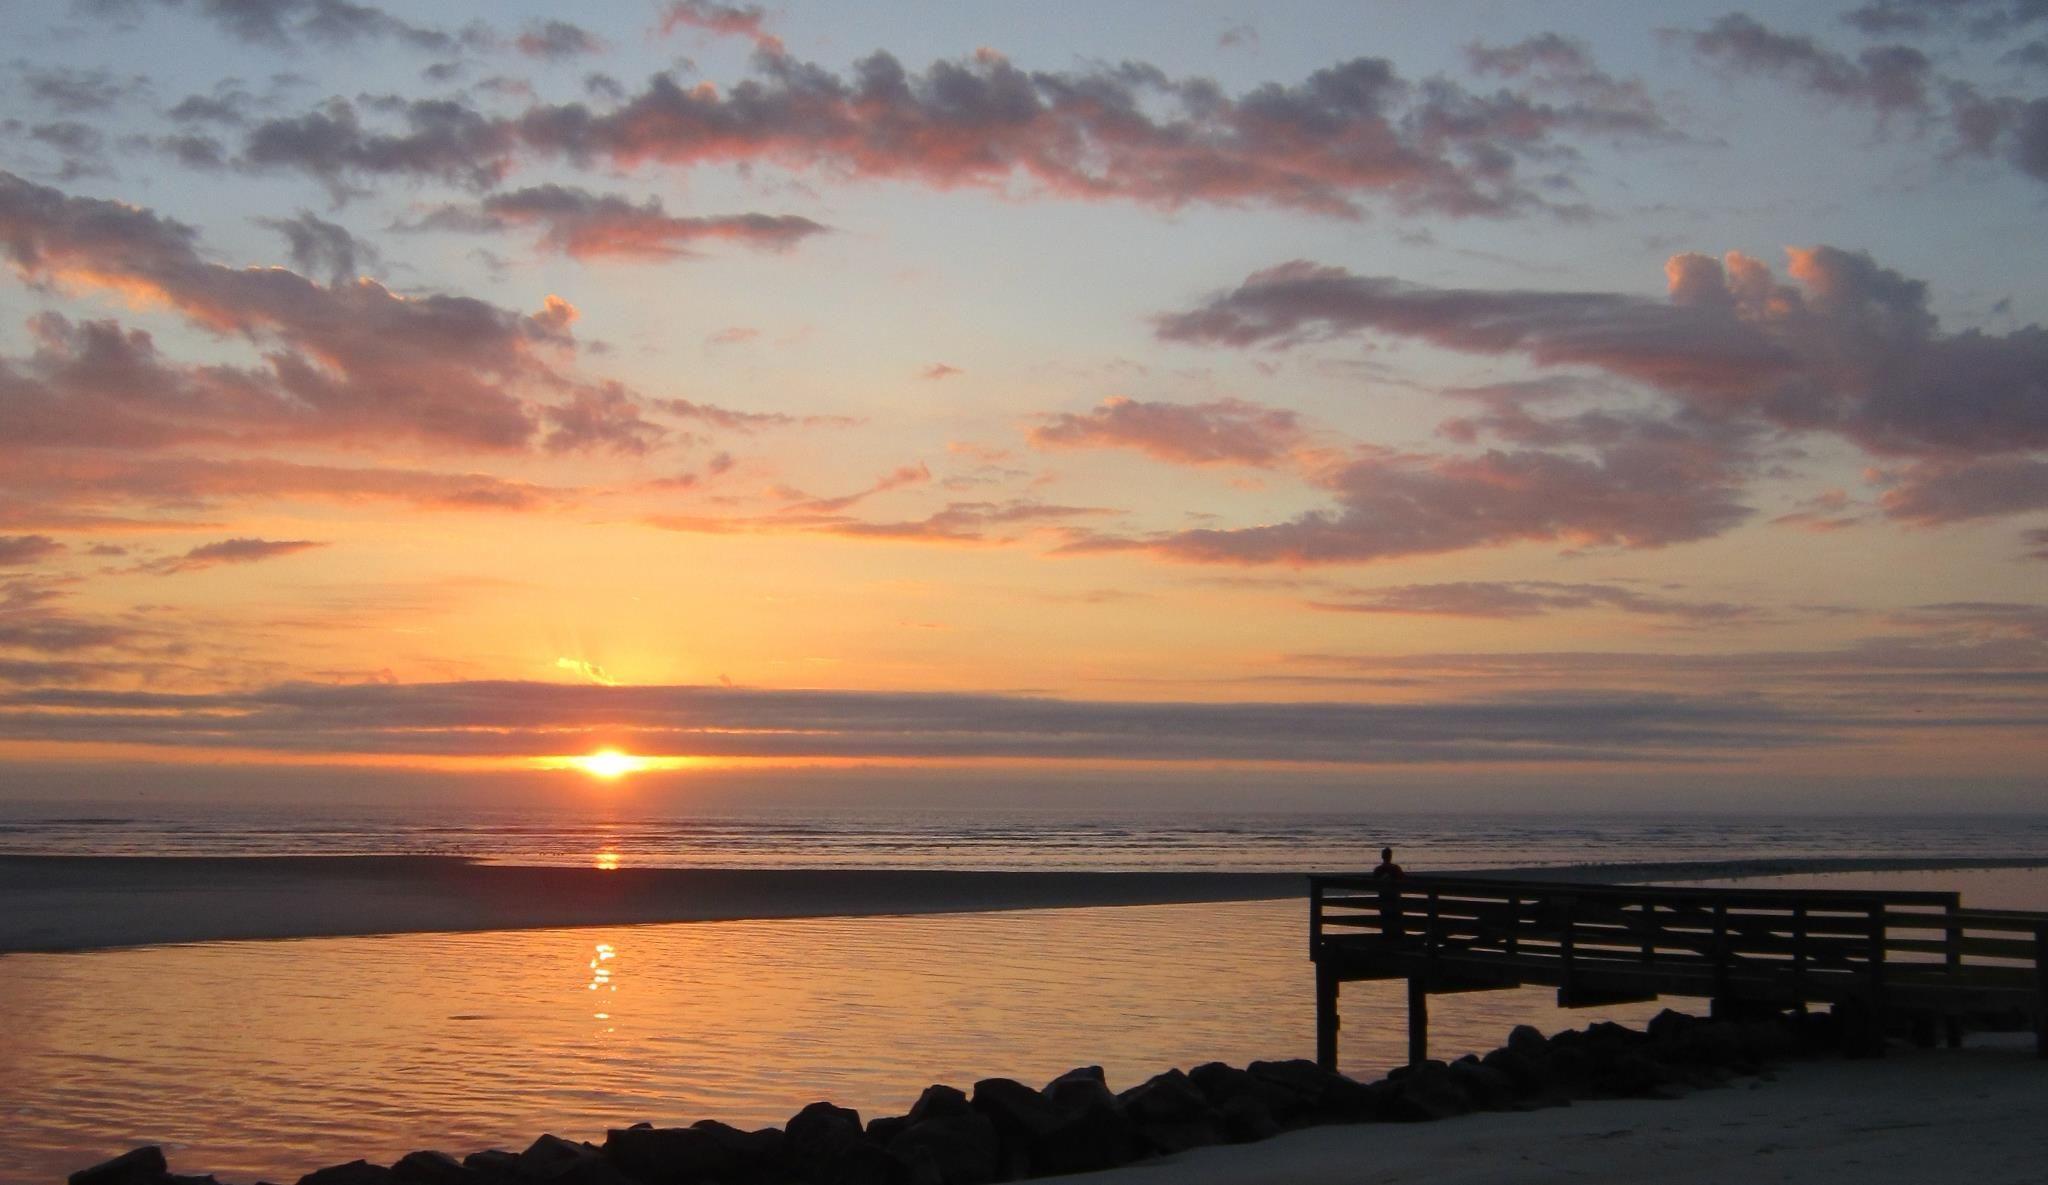 St. Simons Island Sunrise taken by Mac Childers